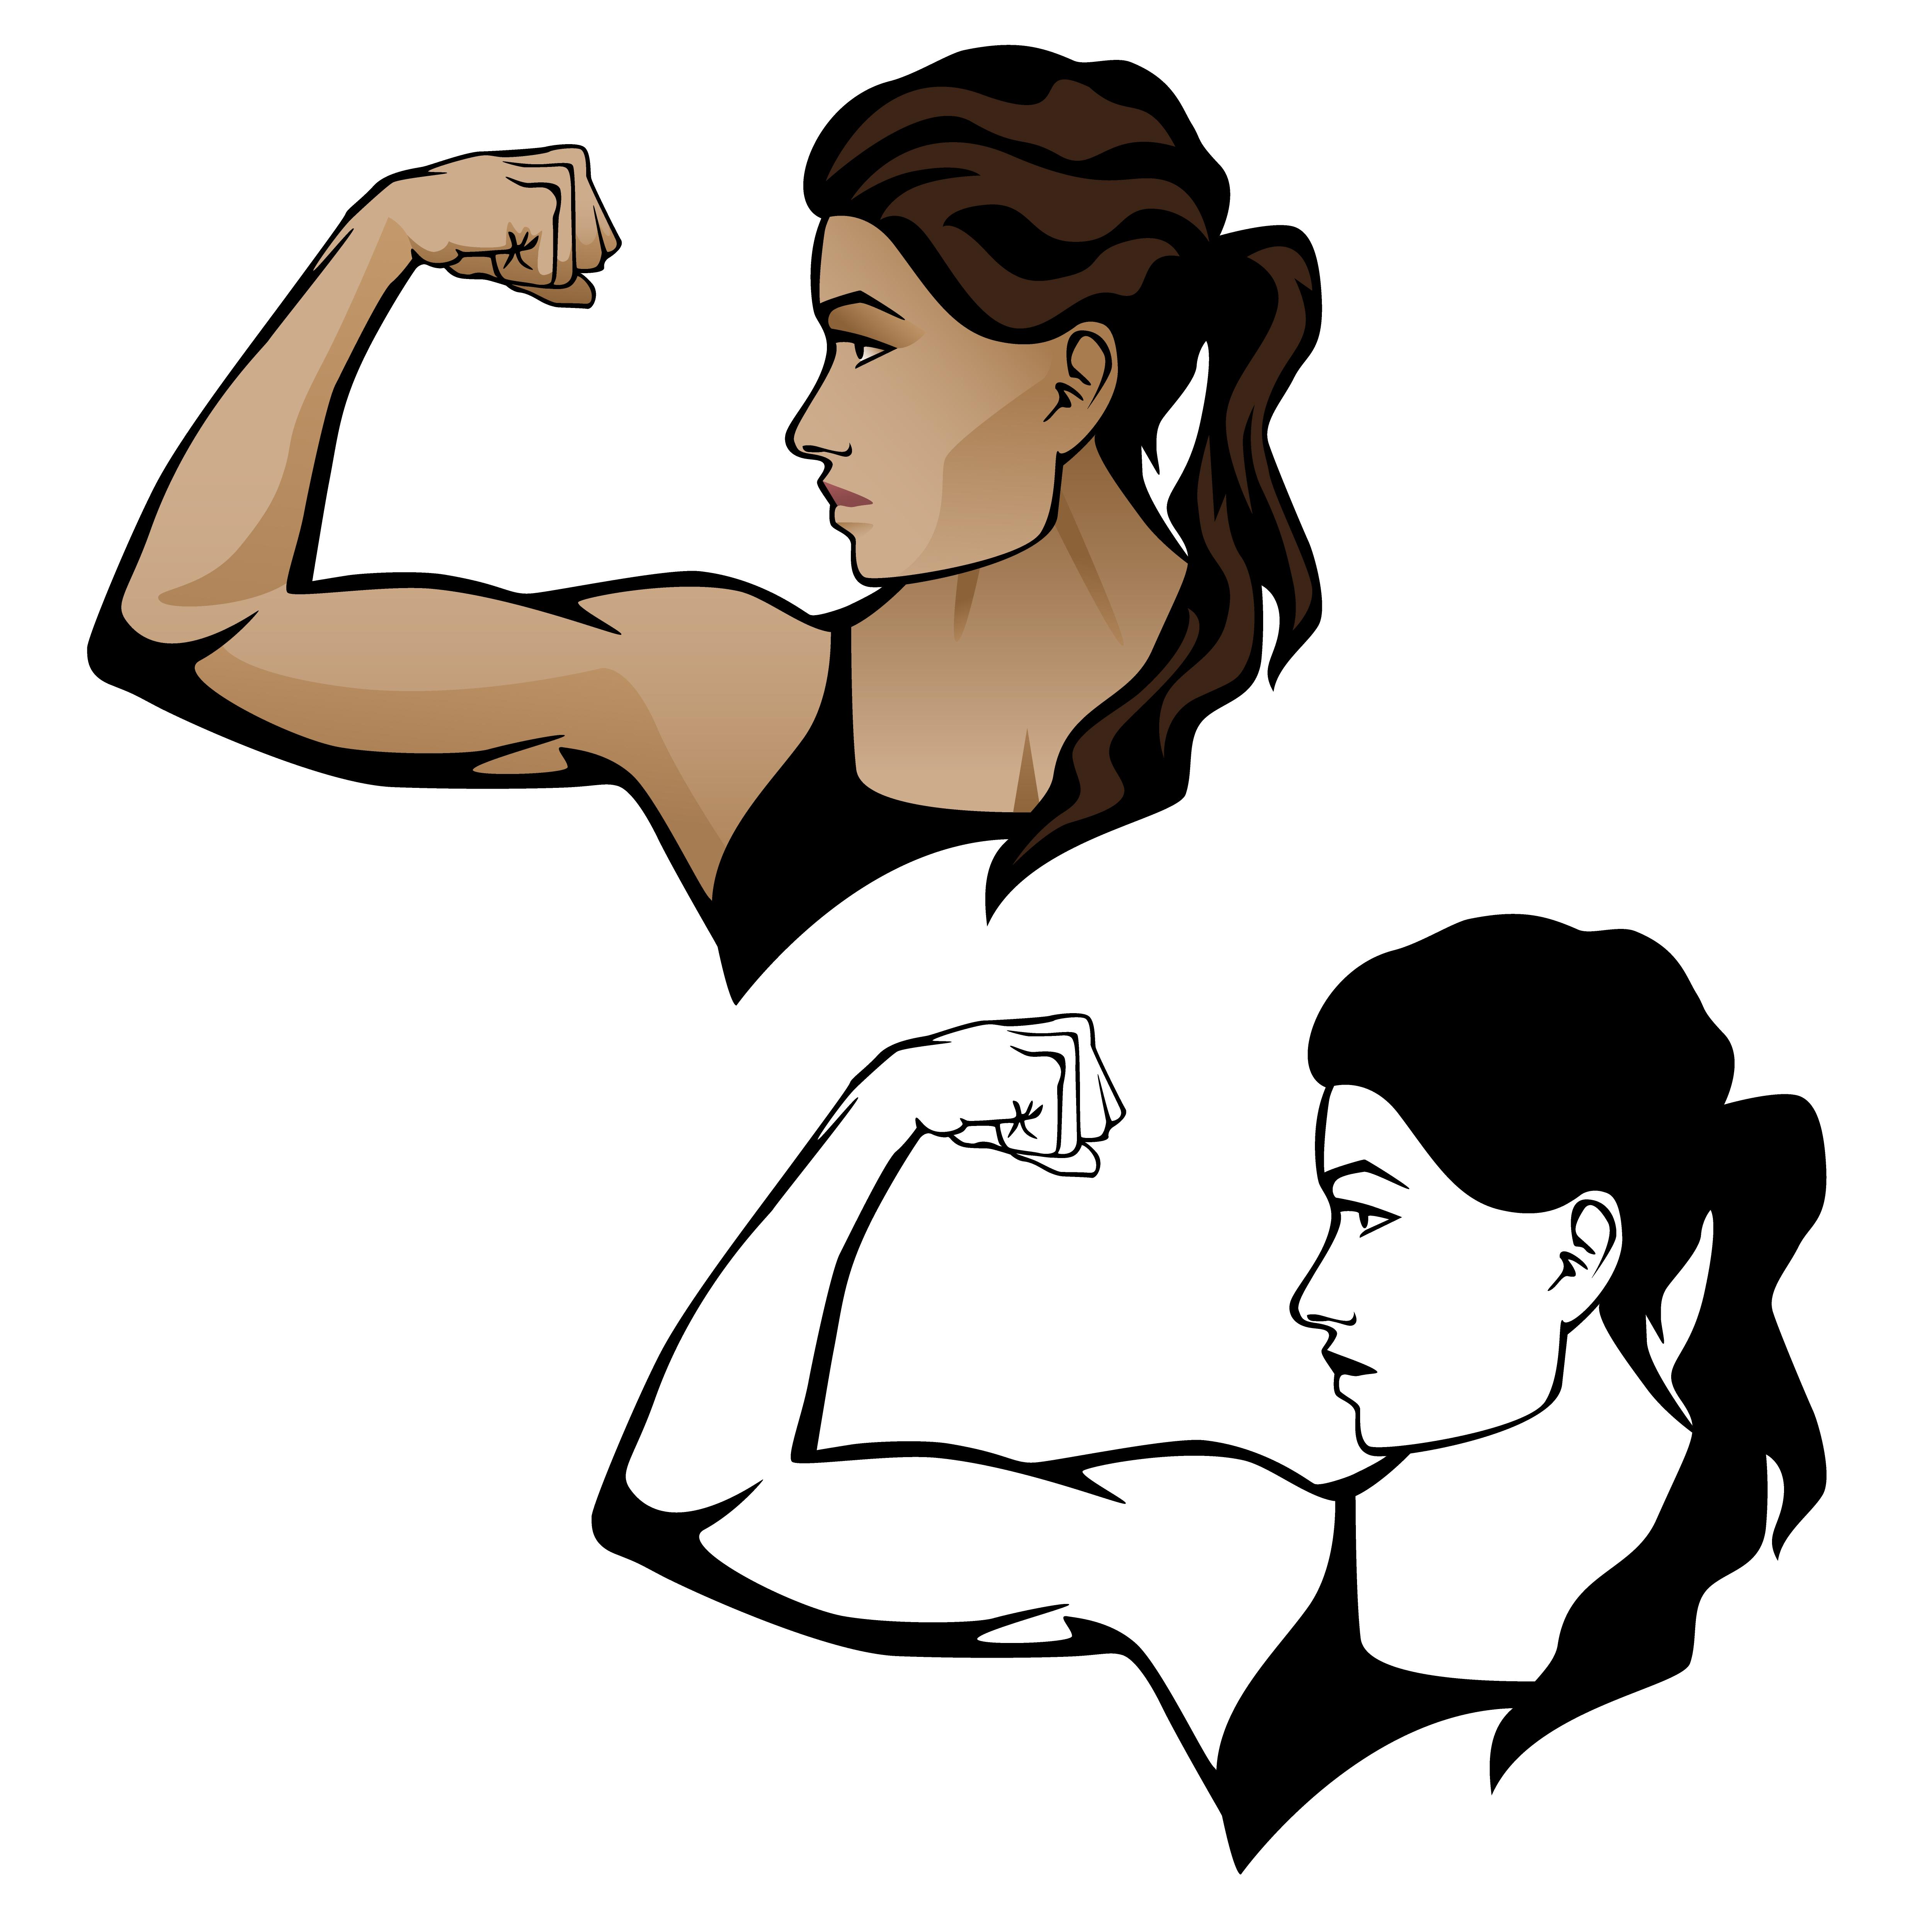 Fitness Feminino Mulher Flexionando Ilustracao De Braco Download